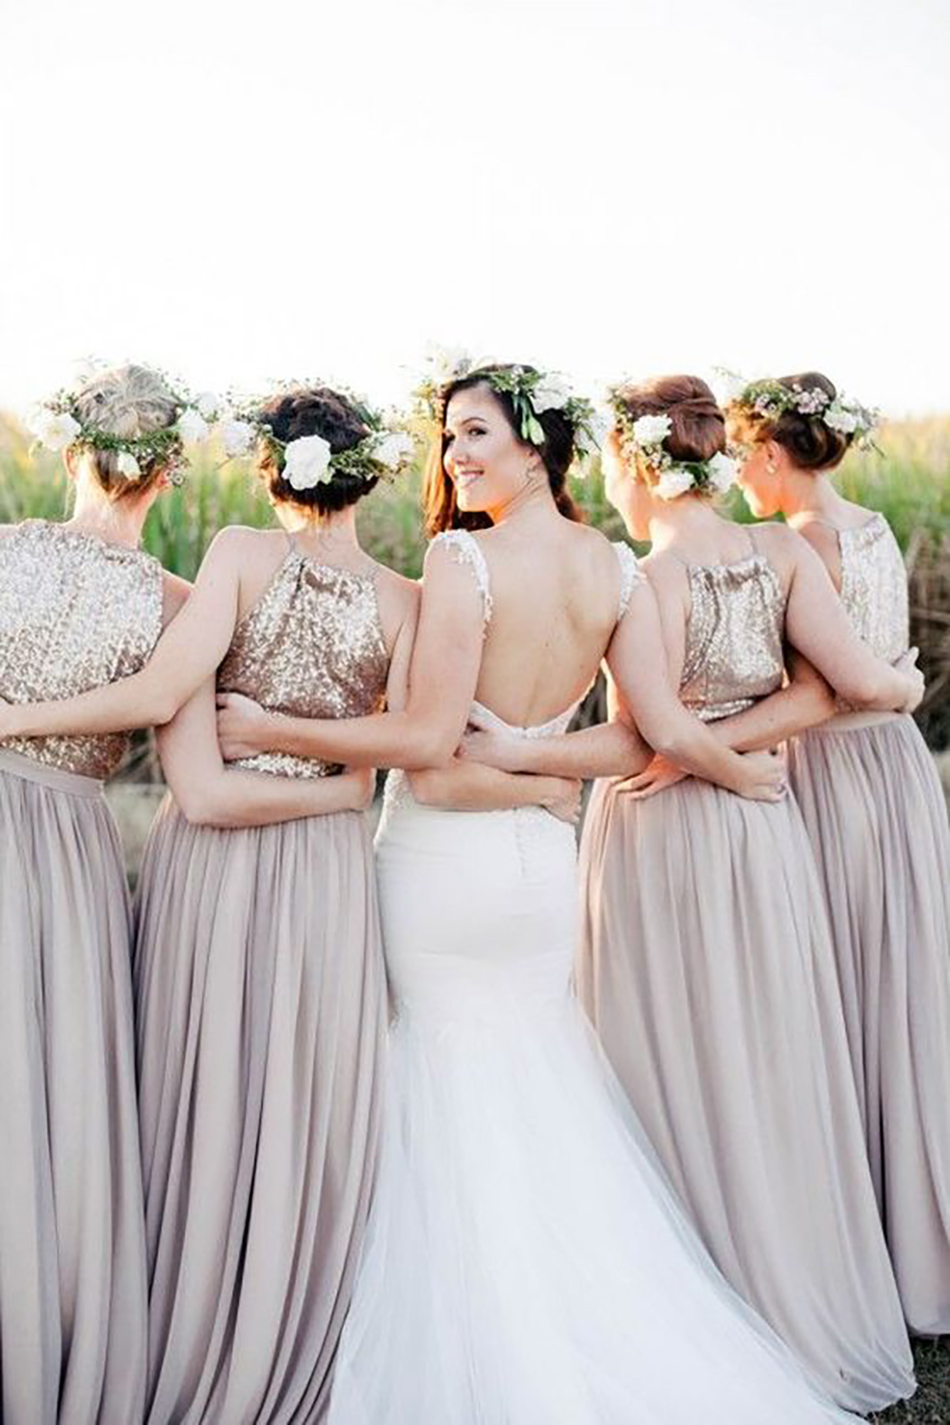 Metallic bridesmaid dresses wedding ideas chwv wedding ideas by colour metallic bridesmaid dresses ombrellifo Choice Image